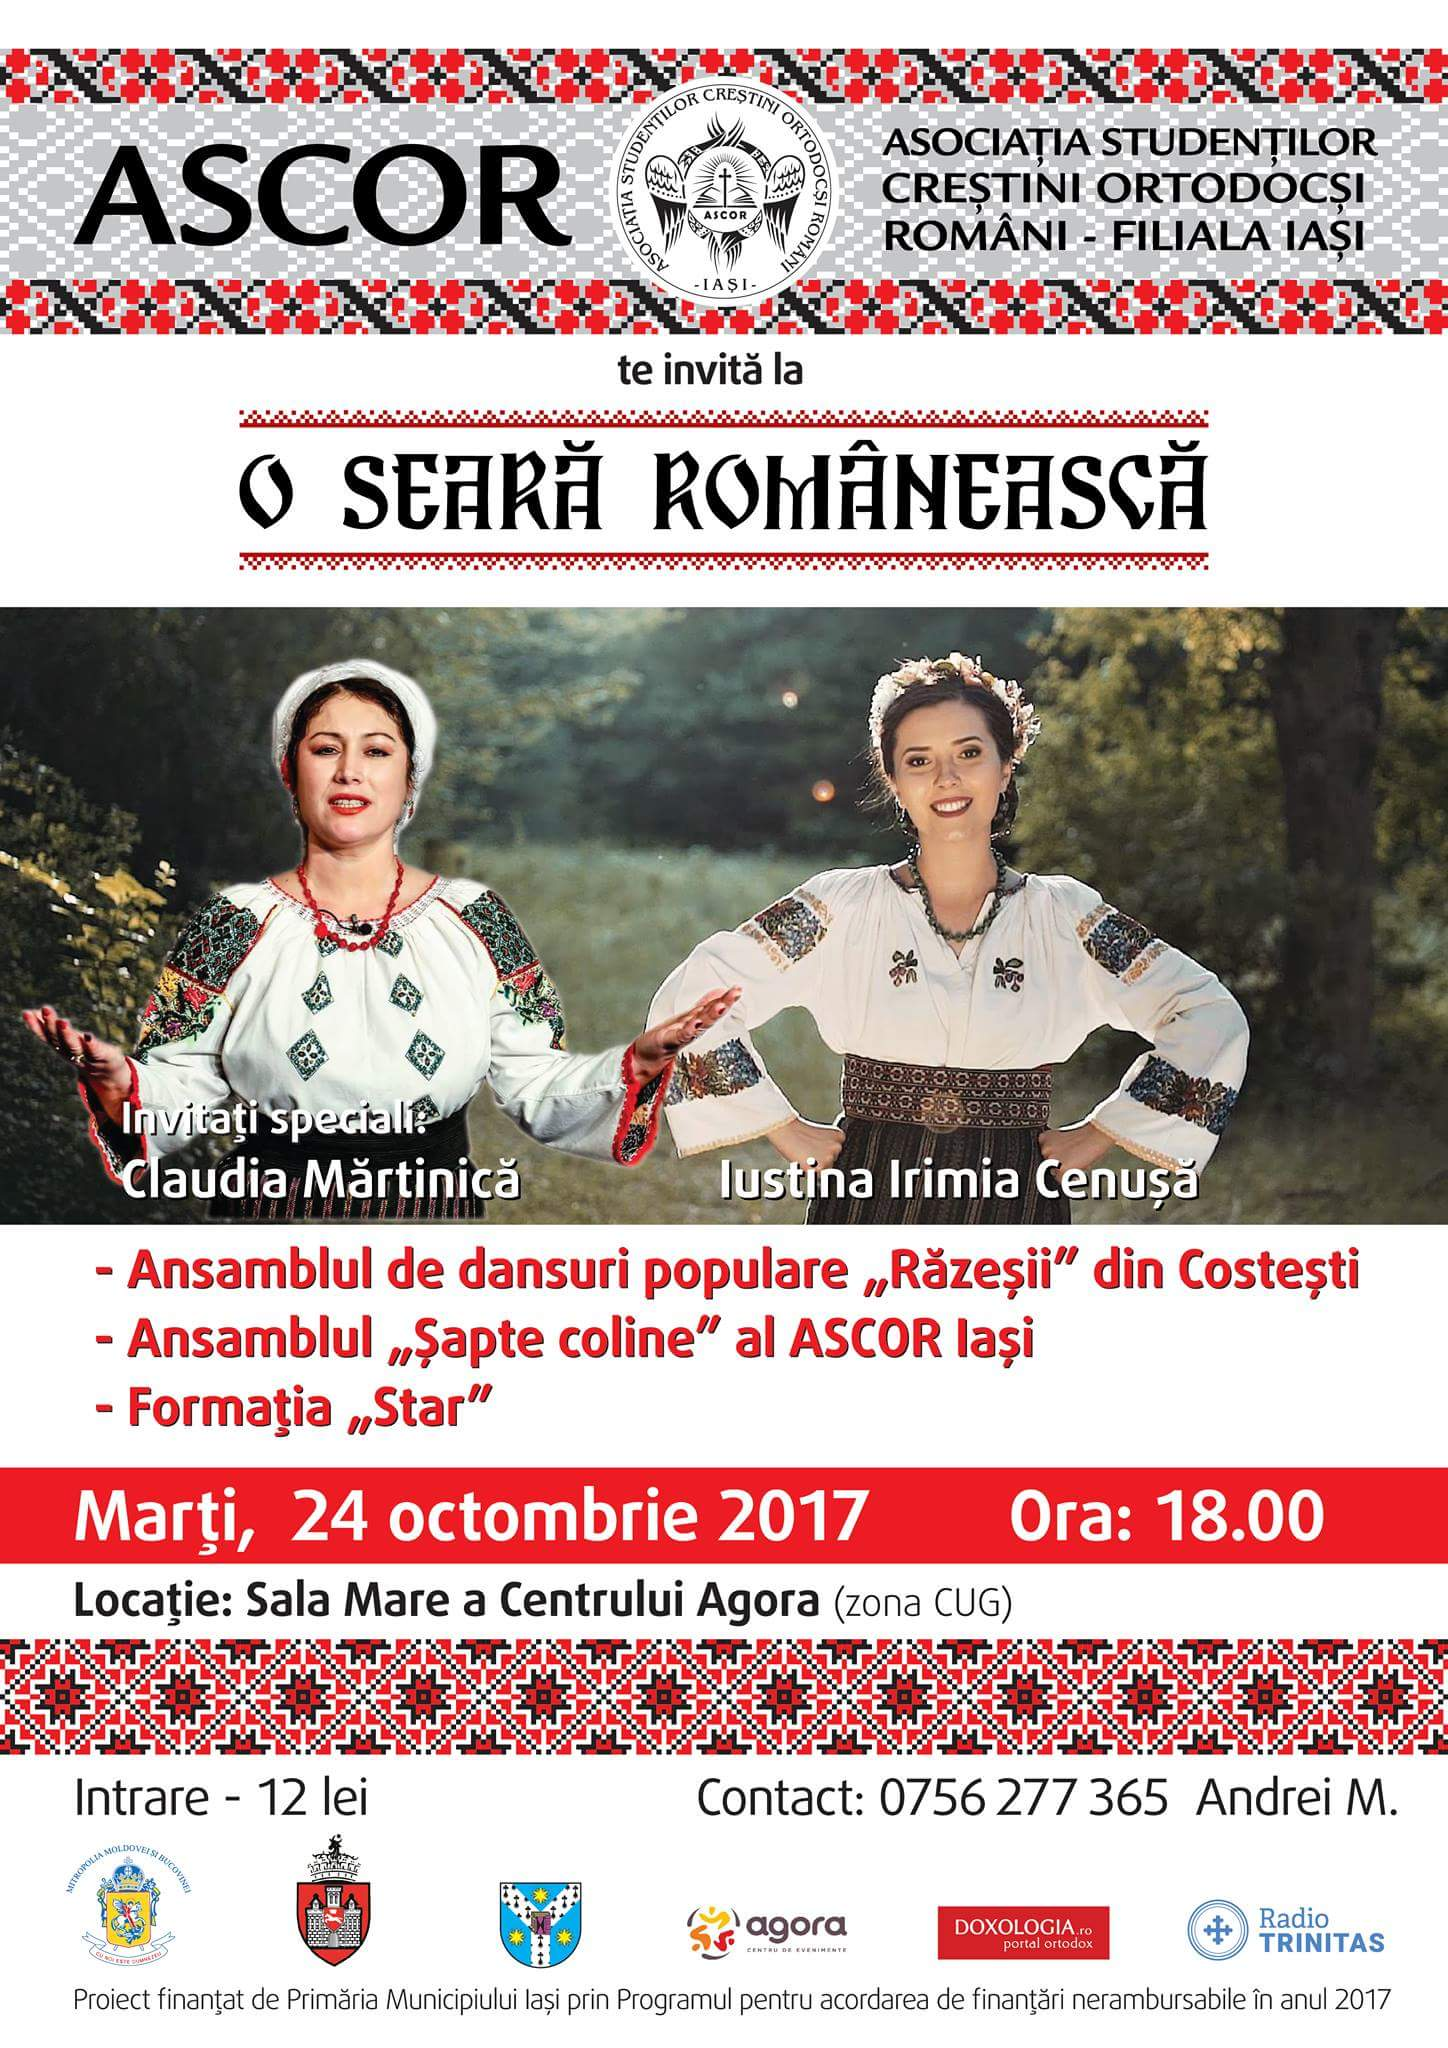 O_seara_romaneasca_ascor_iasi